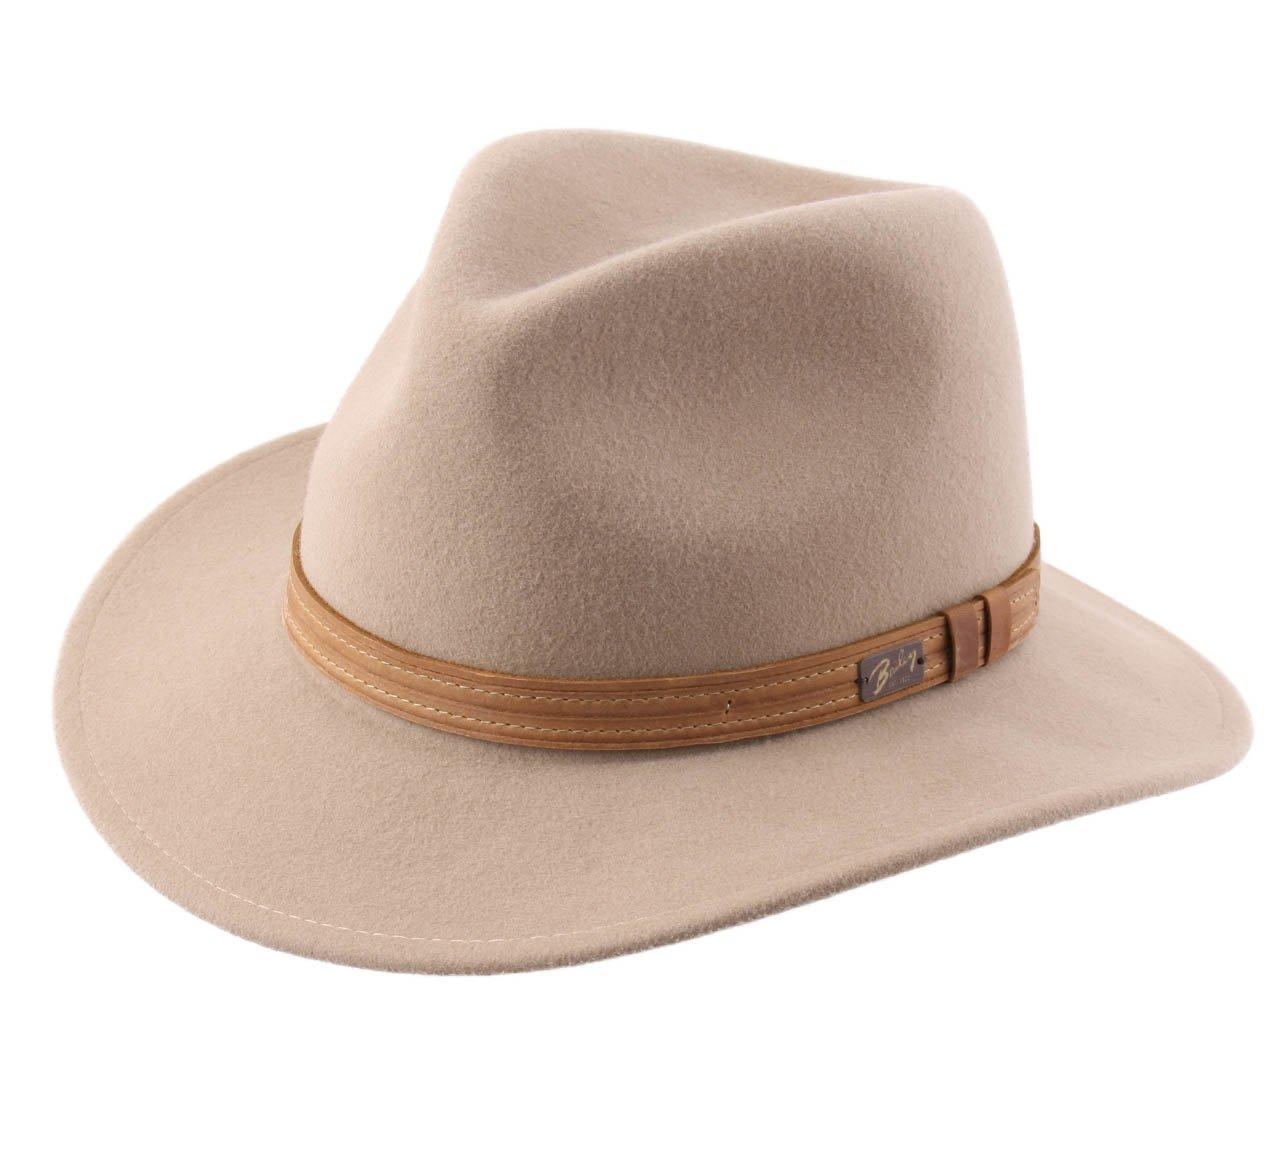 Bailey Of Hollywood Kesey Wool Felt Fedora Hat Size L